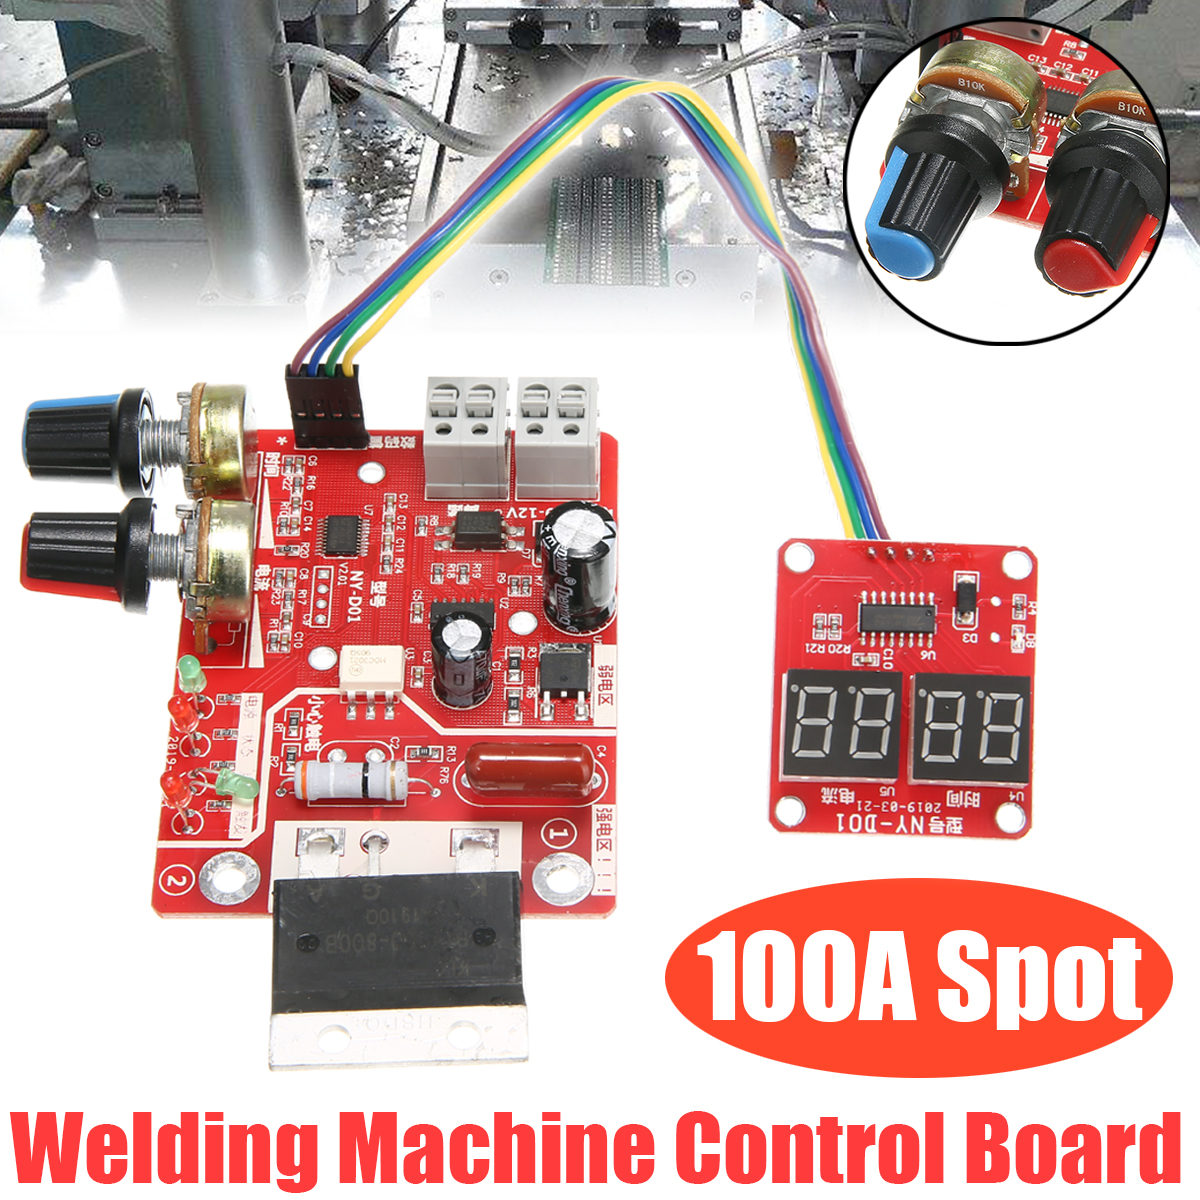 100A Digital Spot Welder Machine Time Control Board Spot Welding Adjust Time & Current Transformer Controller Panel Module